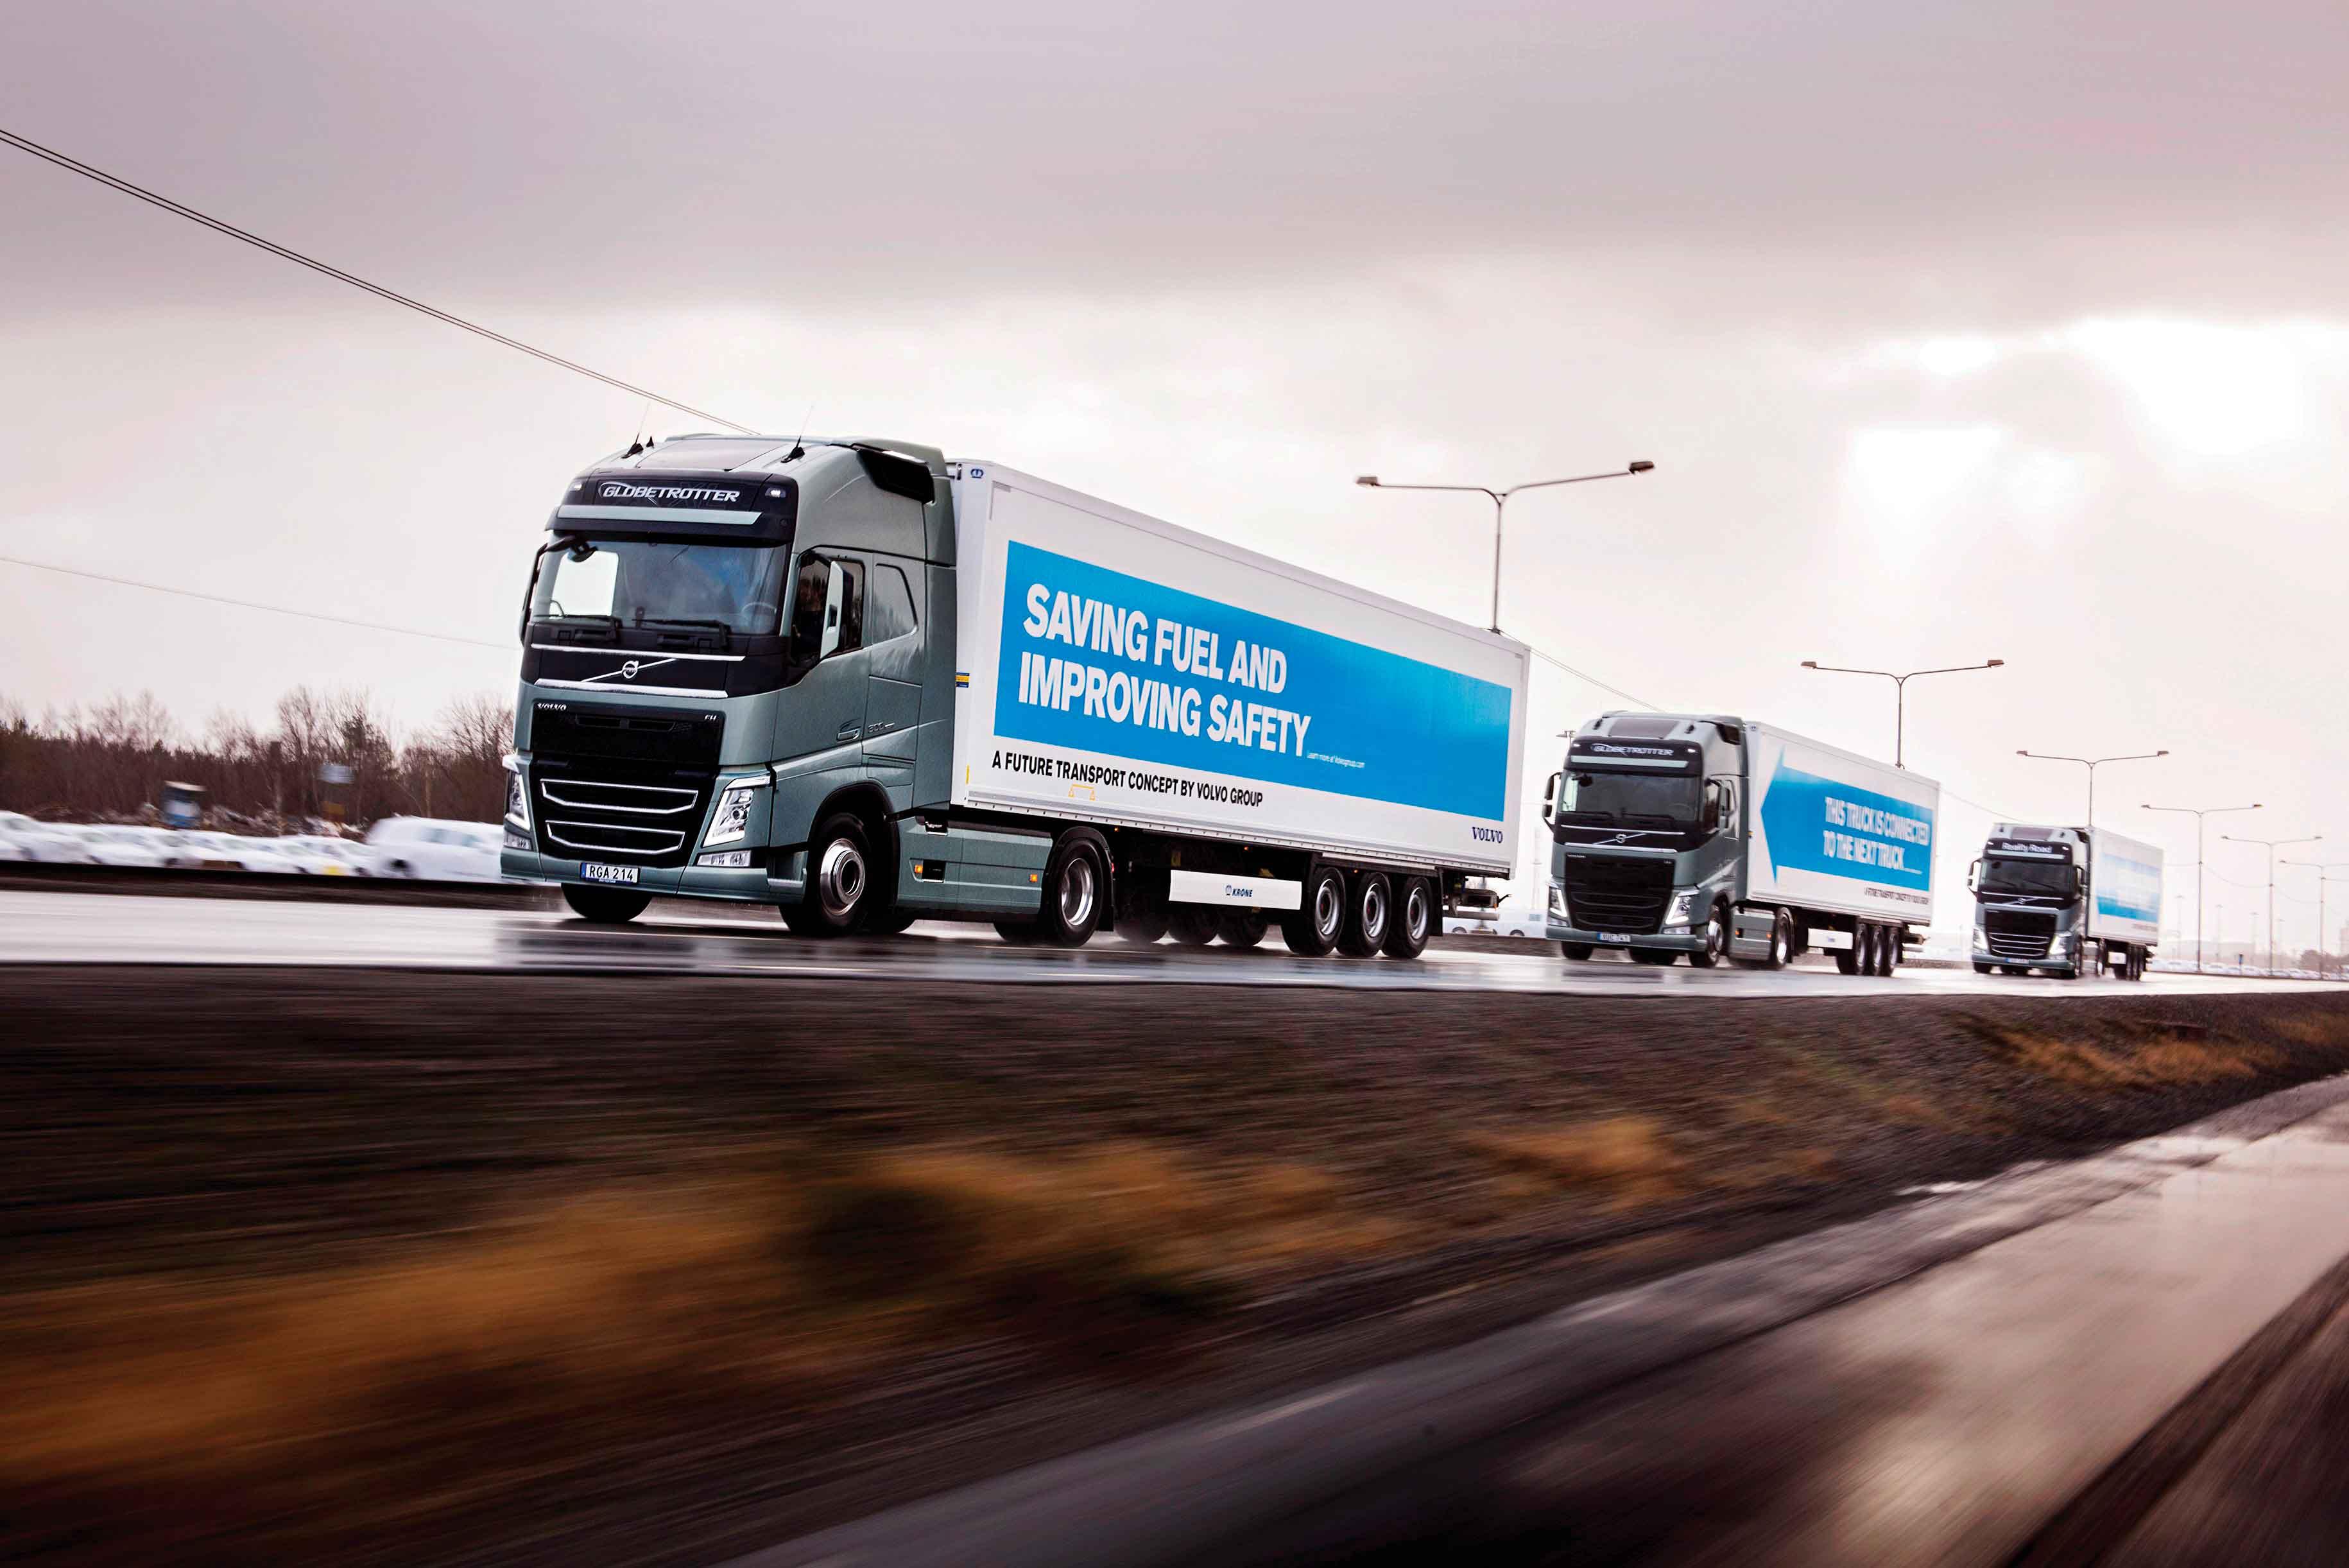 Autonomous trucks: How soon and how much?